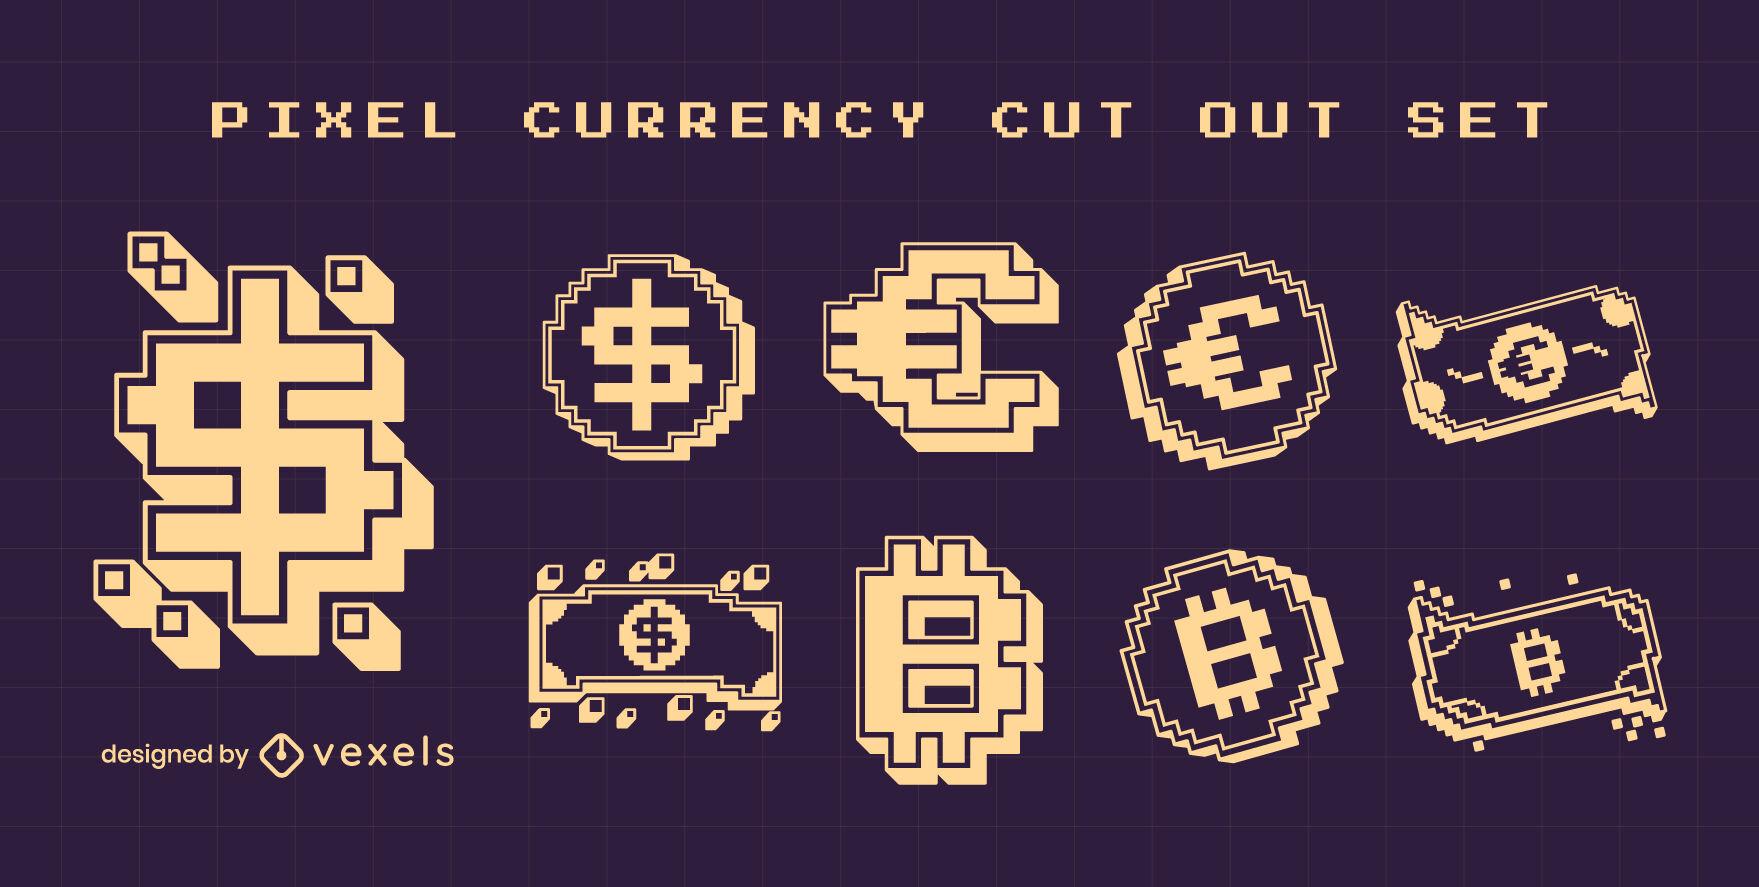 Währungssymbole schneiden Pixel-Art-Set aus